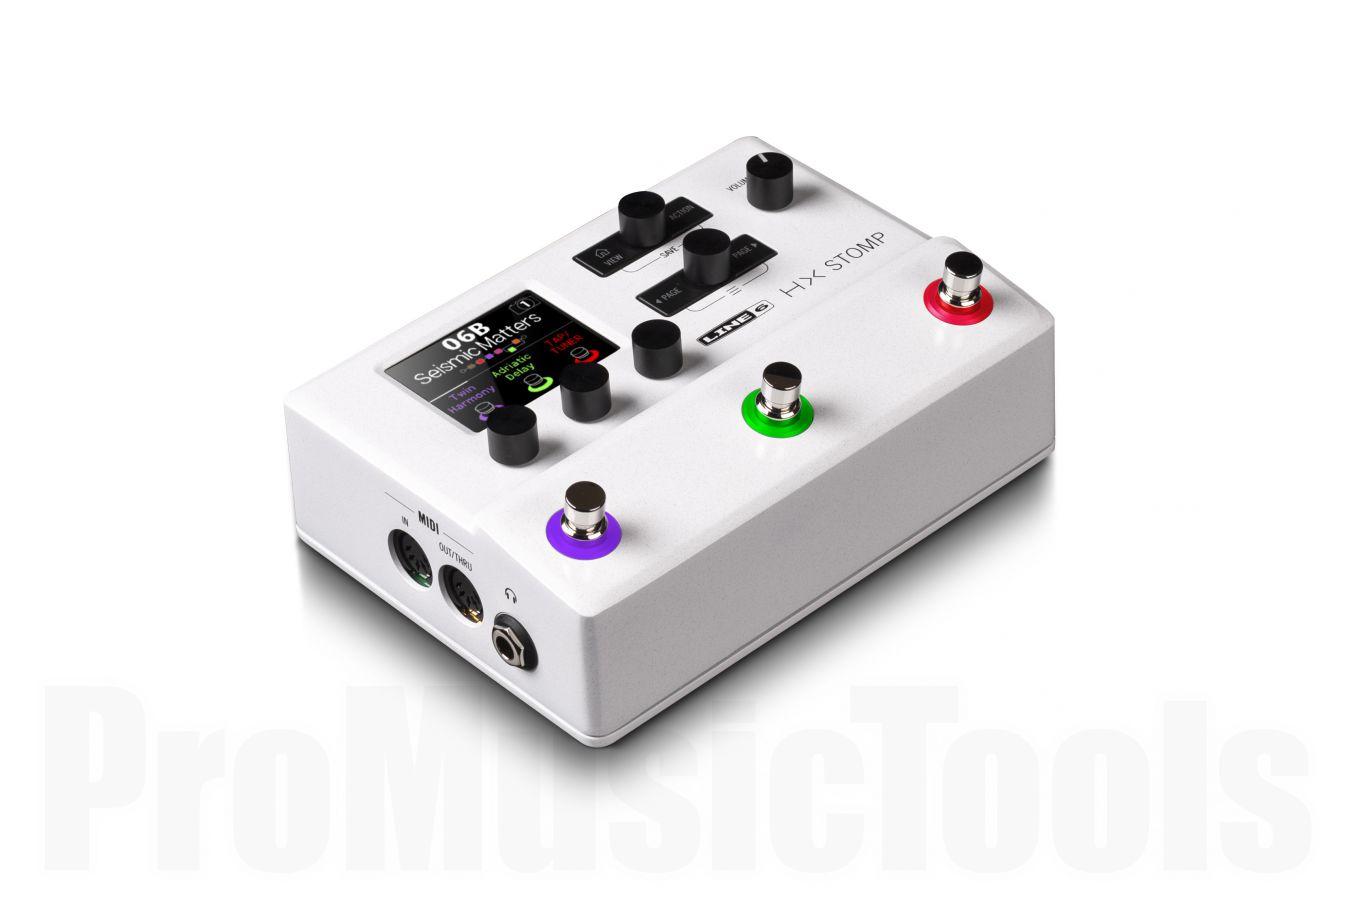 Line 6 HX Stomp White Limited Edition